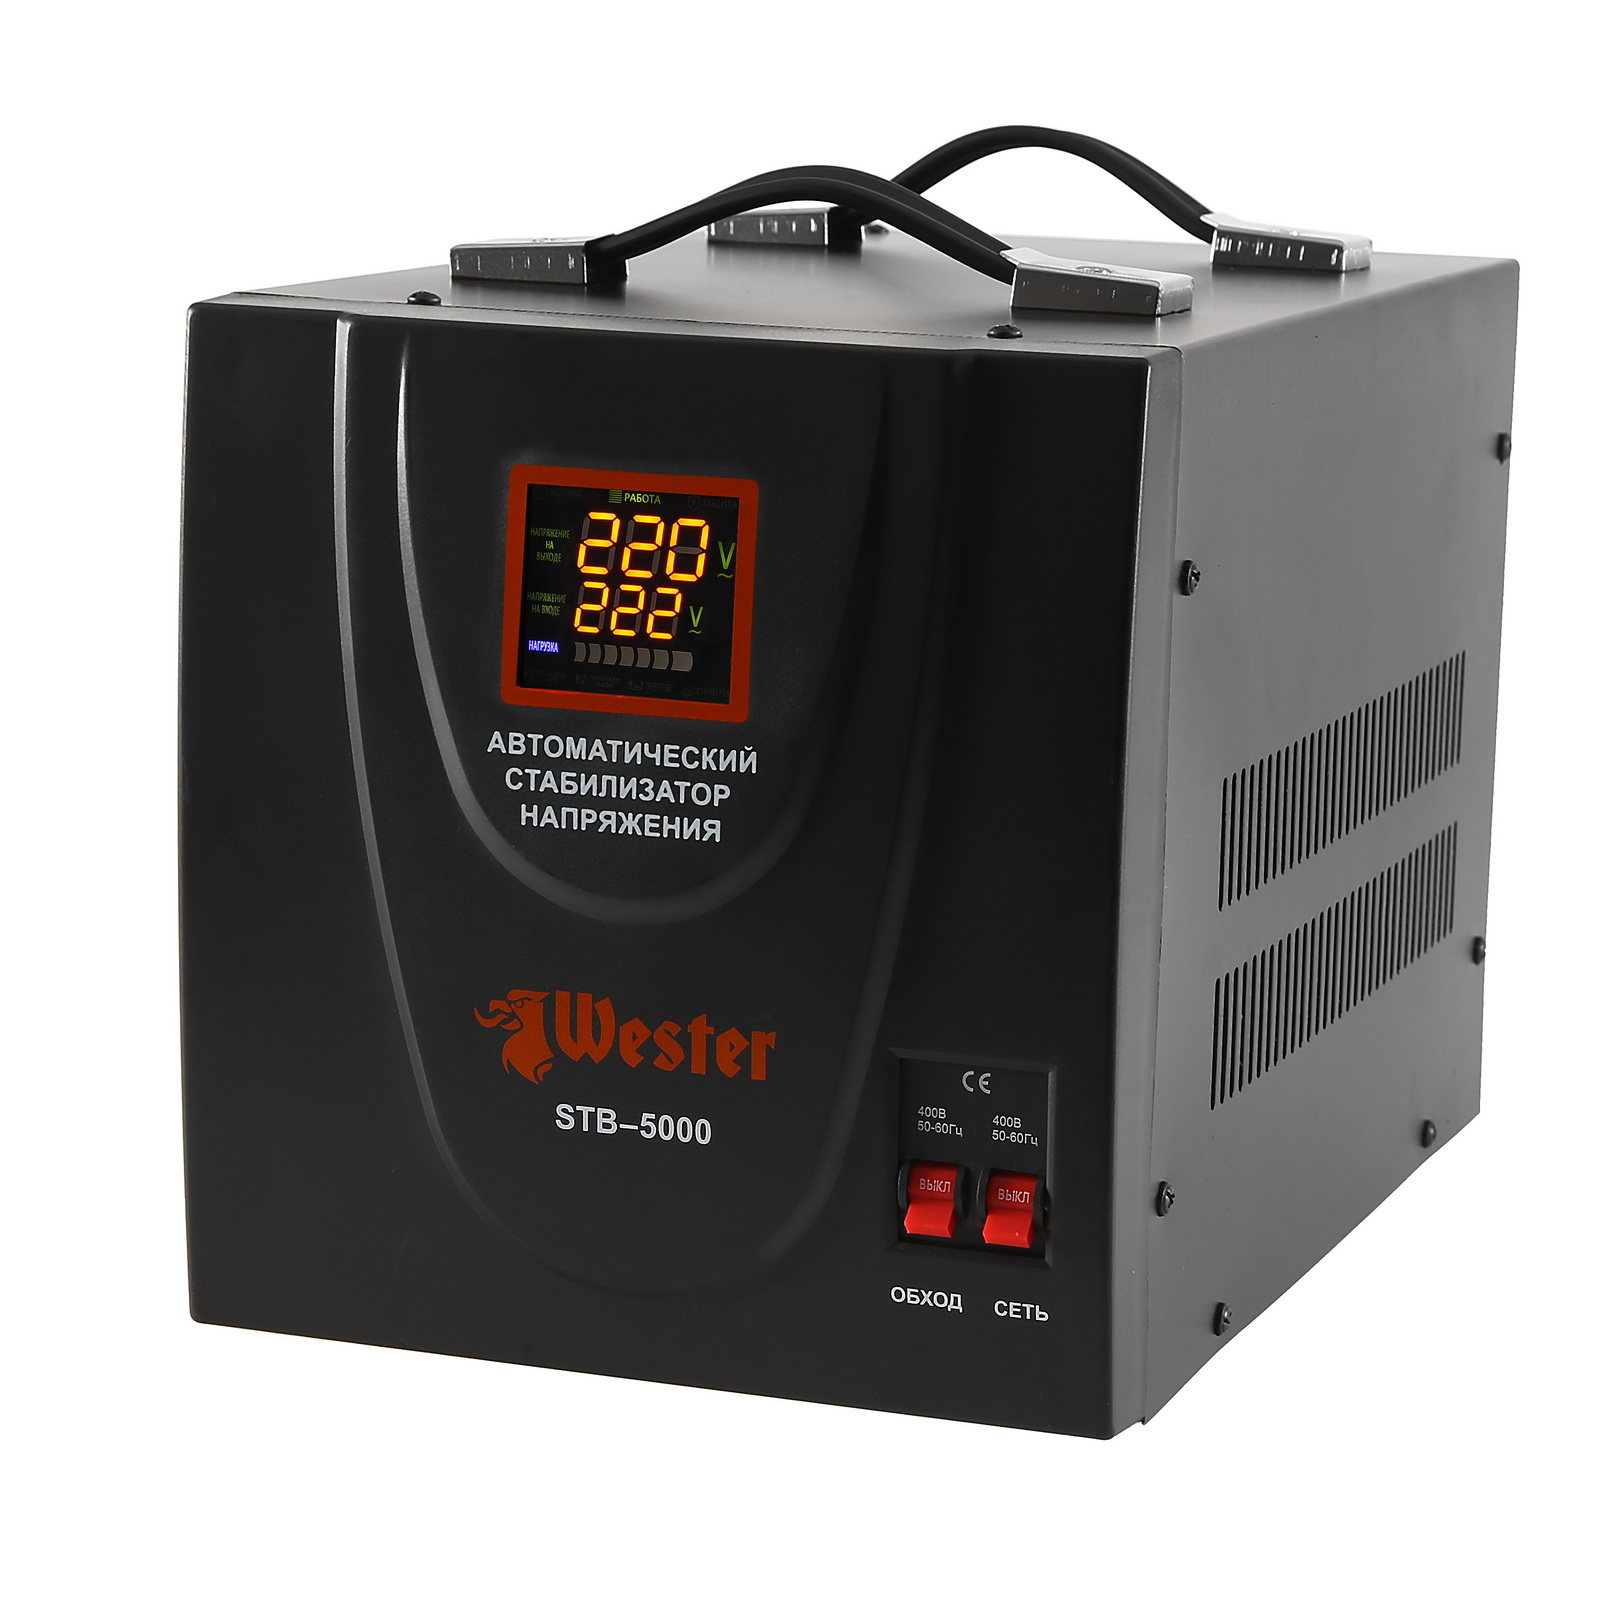 все цены на Стабилизатор напряжения Wester Stb-5000 онлайн